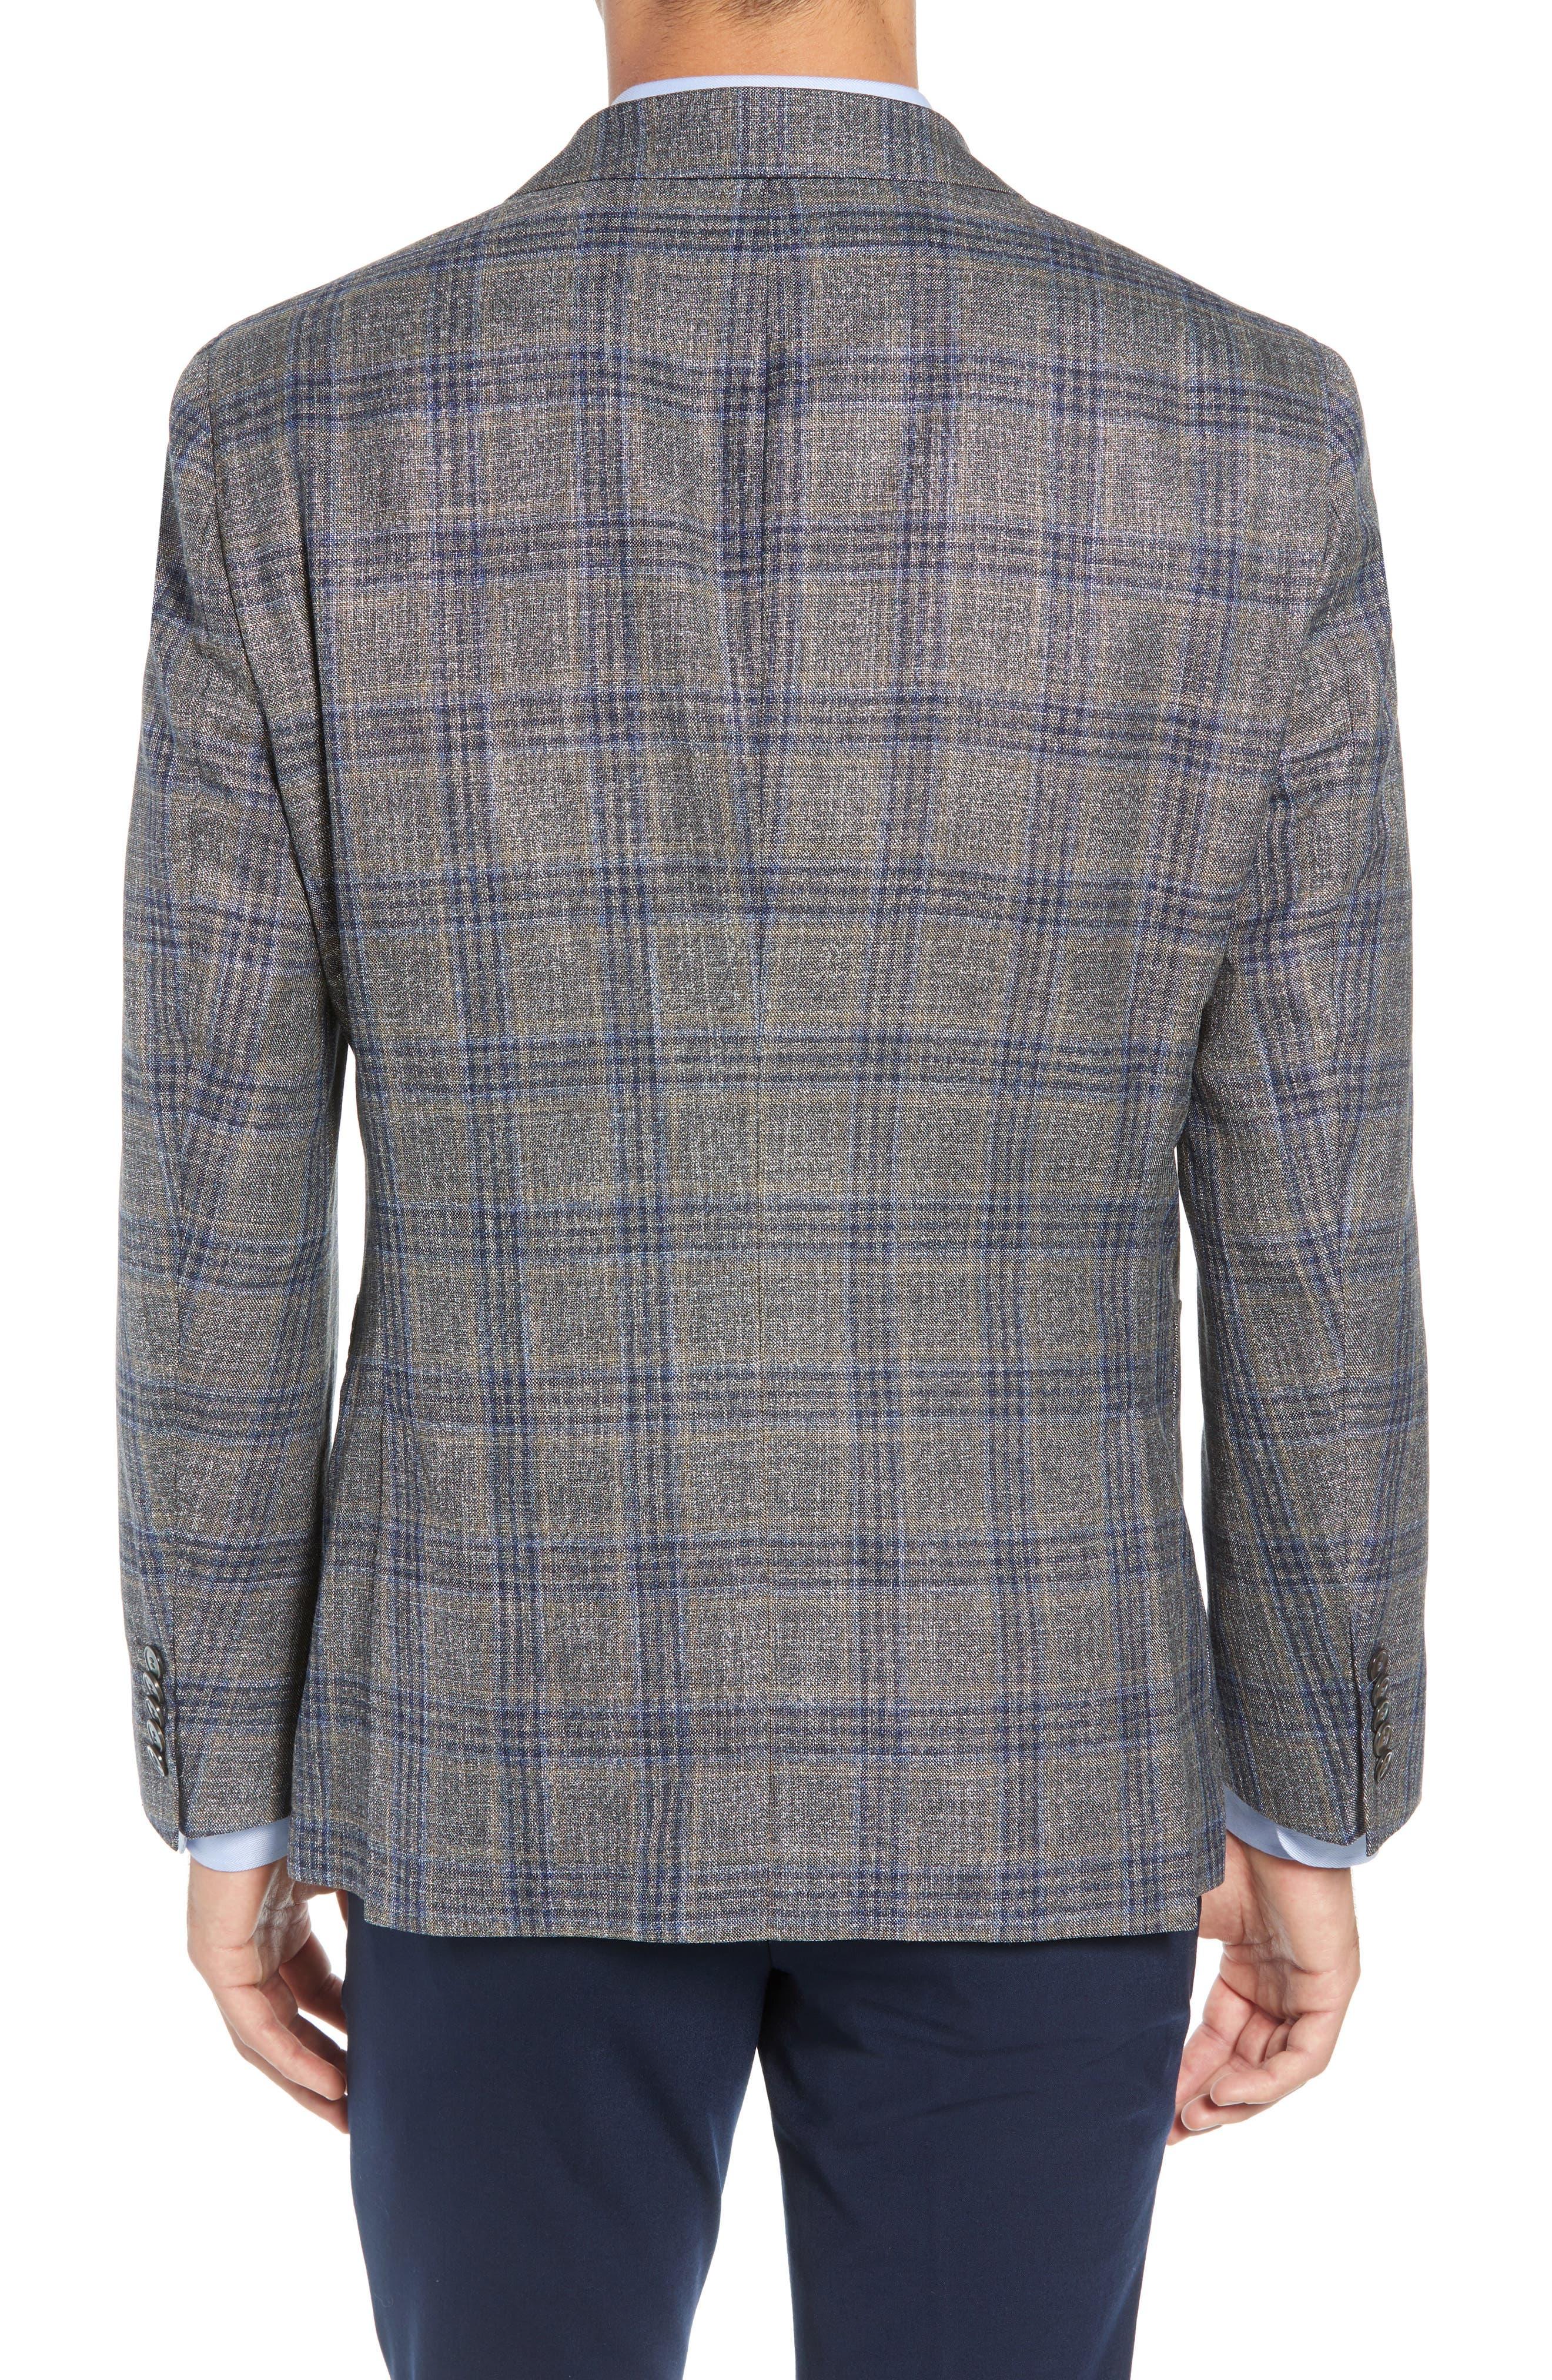 Heston Trim Fit Plaid Wool Blend Sport Coat,                             Alternate thumbnail 2, color,                             TAN